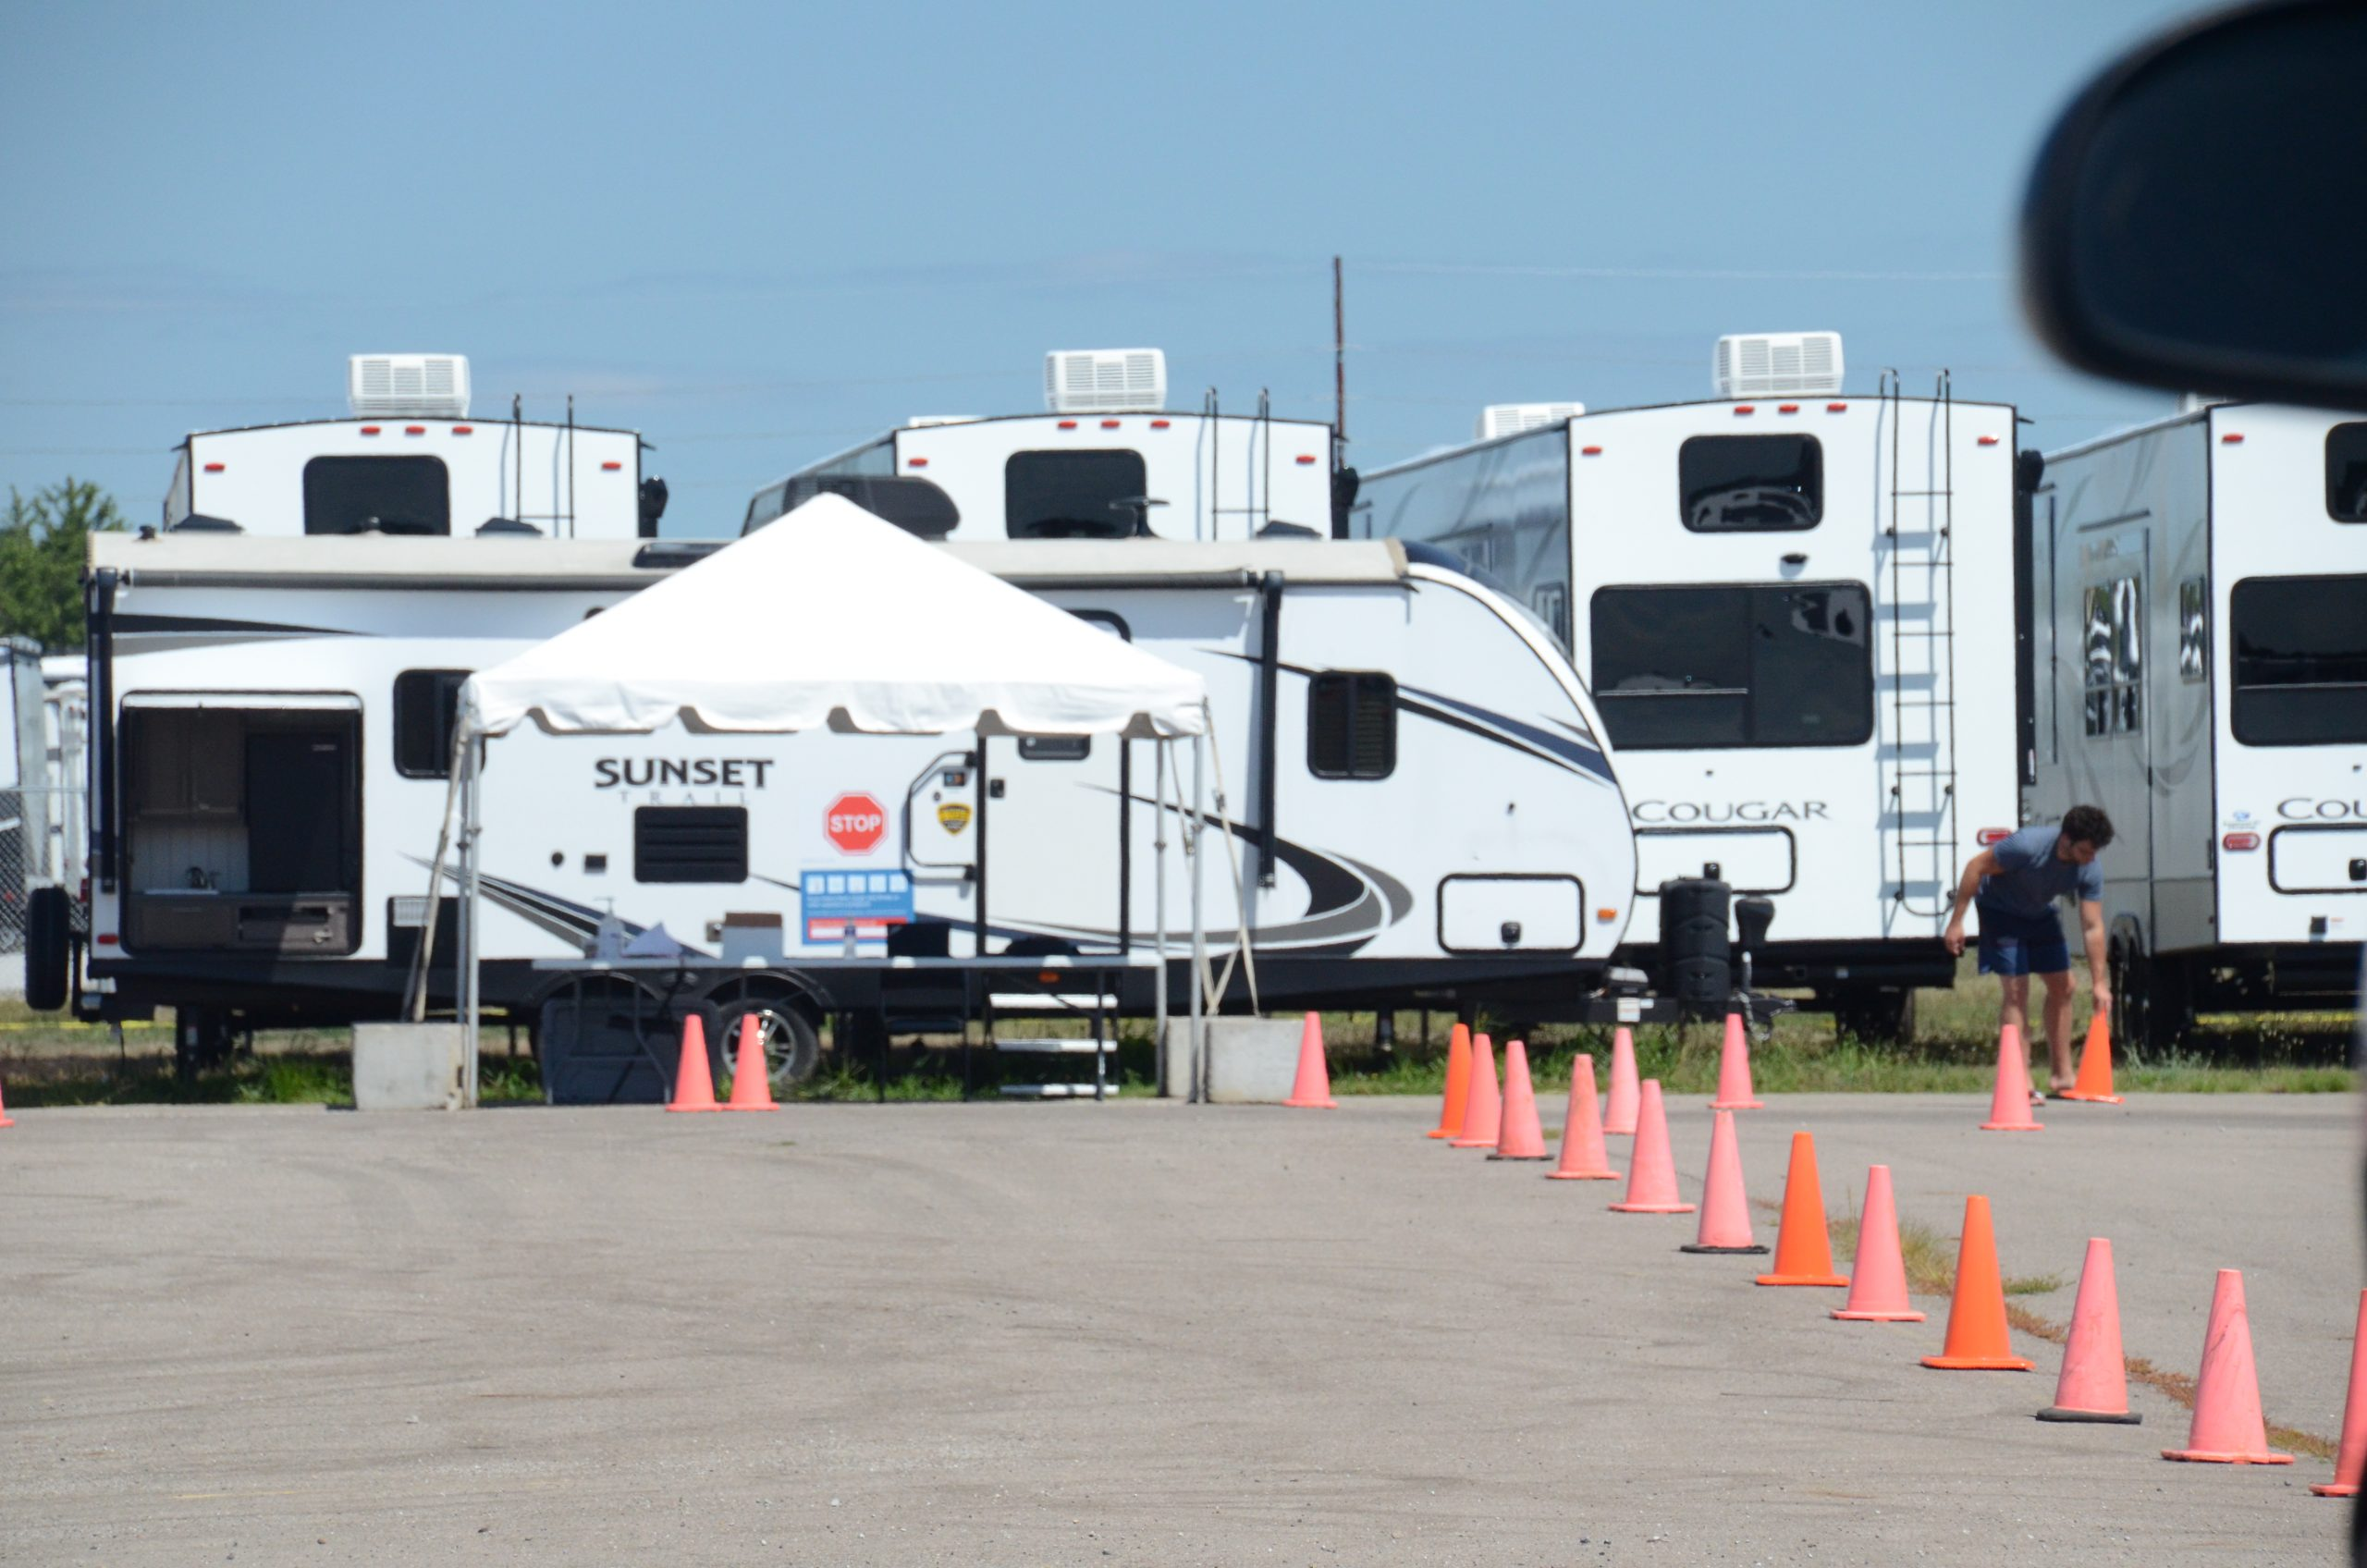 A COVID-19 testing site outside a Keystone RV plant.